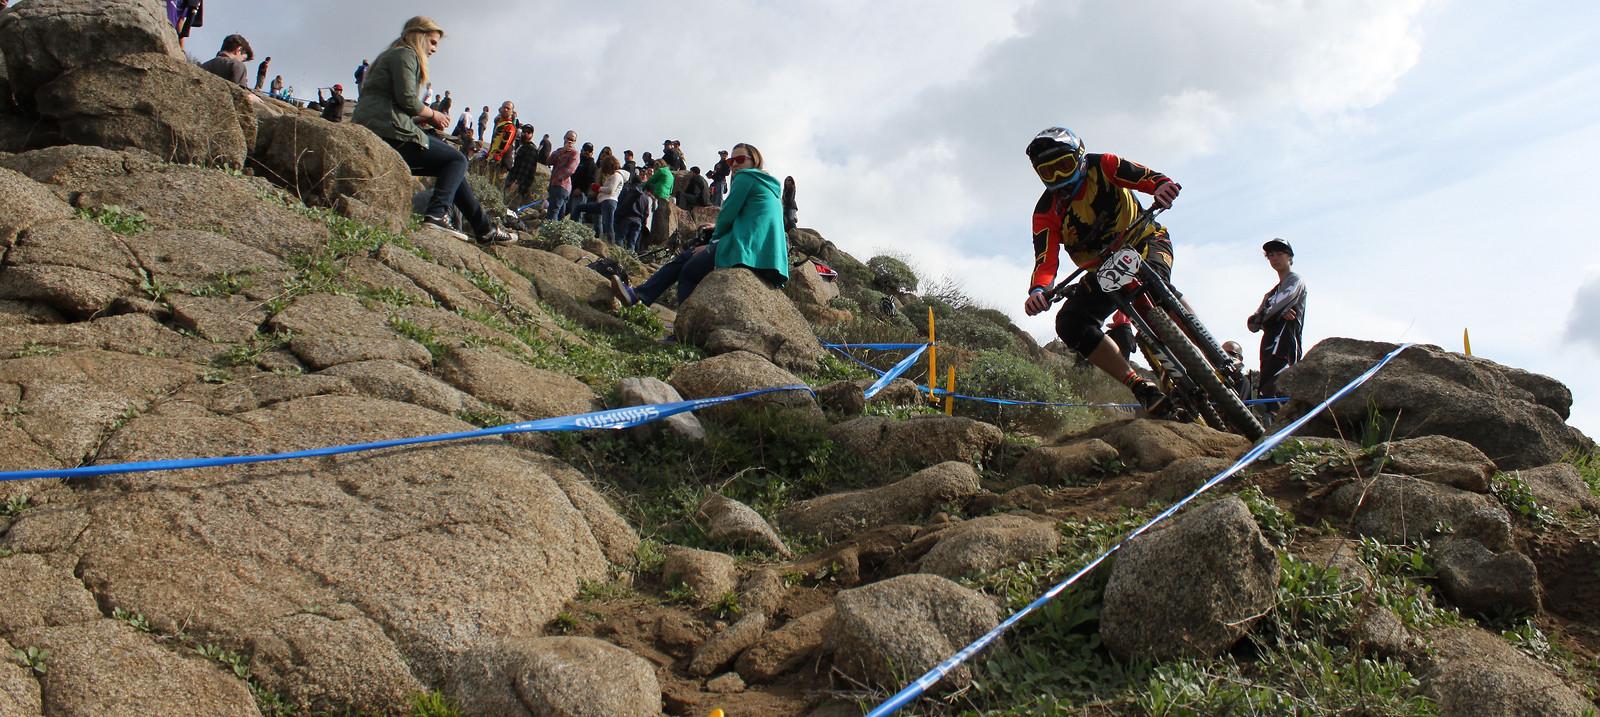 2013 SRC Winter Series Round 3 - ozzer - Mountain Biking Pictures - Vital MTB